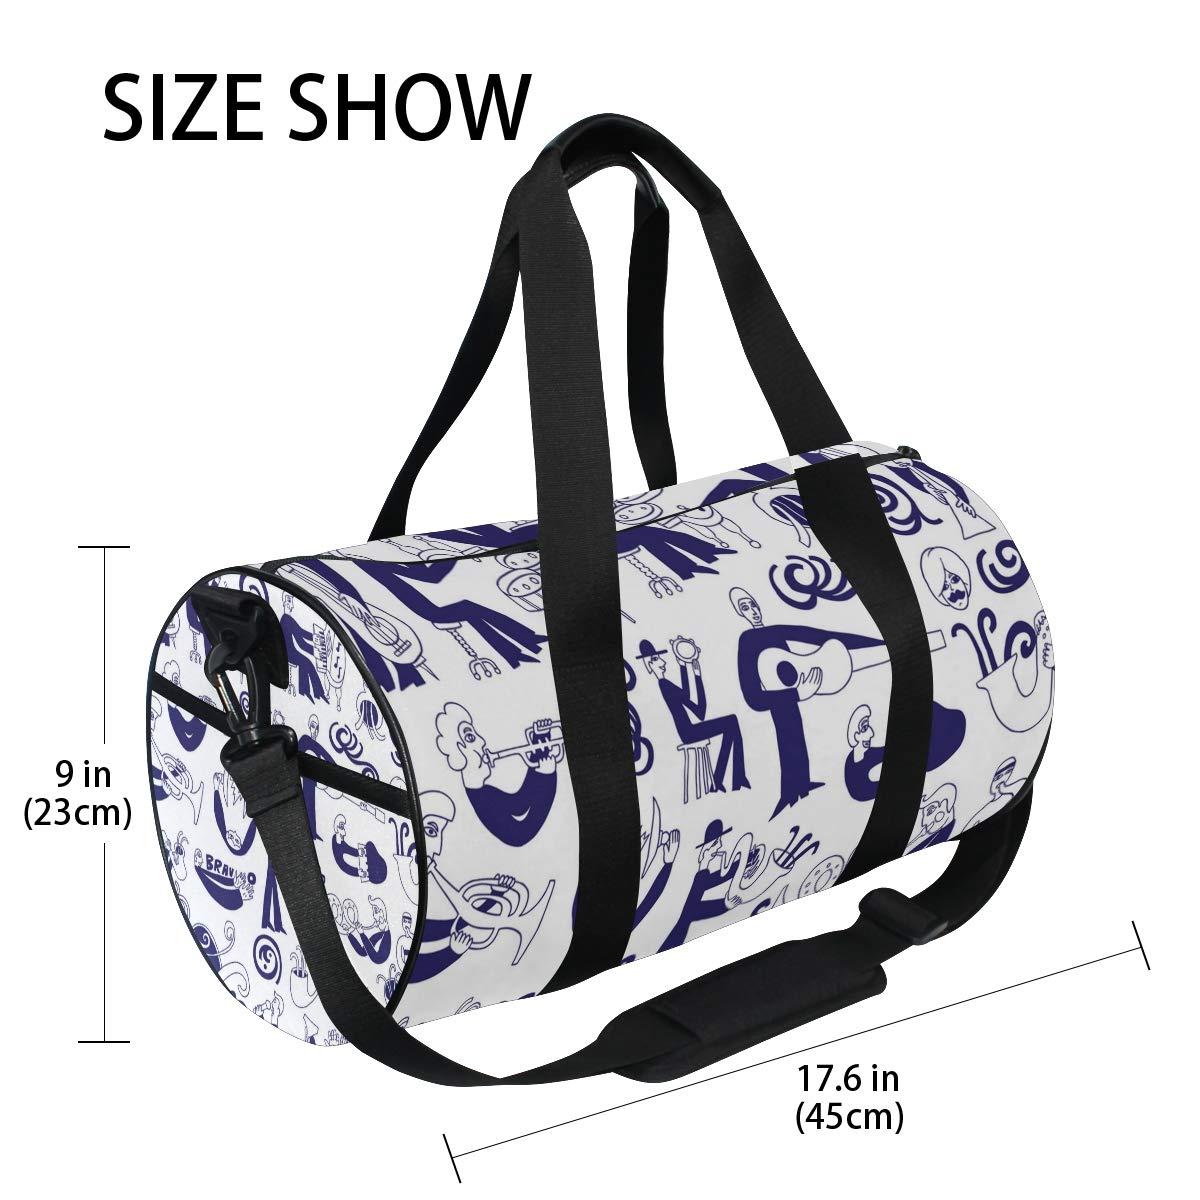 Joy Music ImageWaterproof Non-Slip Wearable Crossbody Bag fitness bag Shoulder Bag